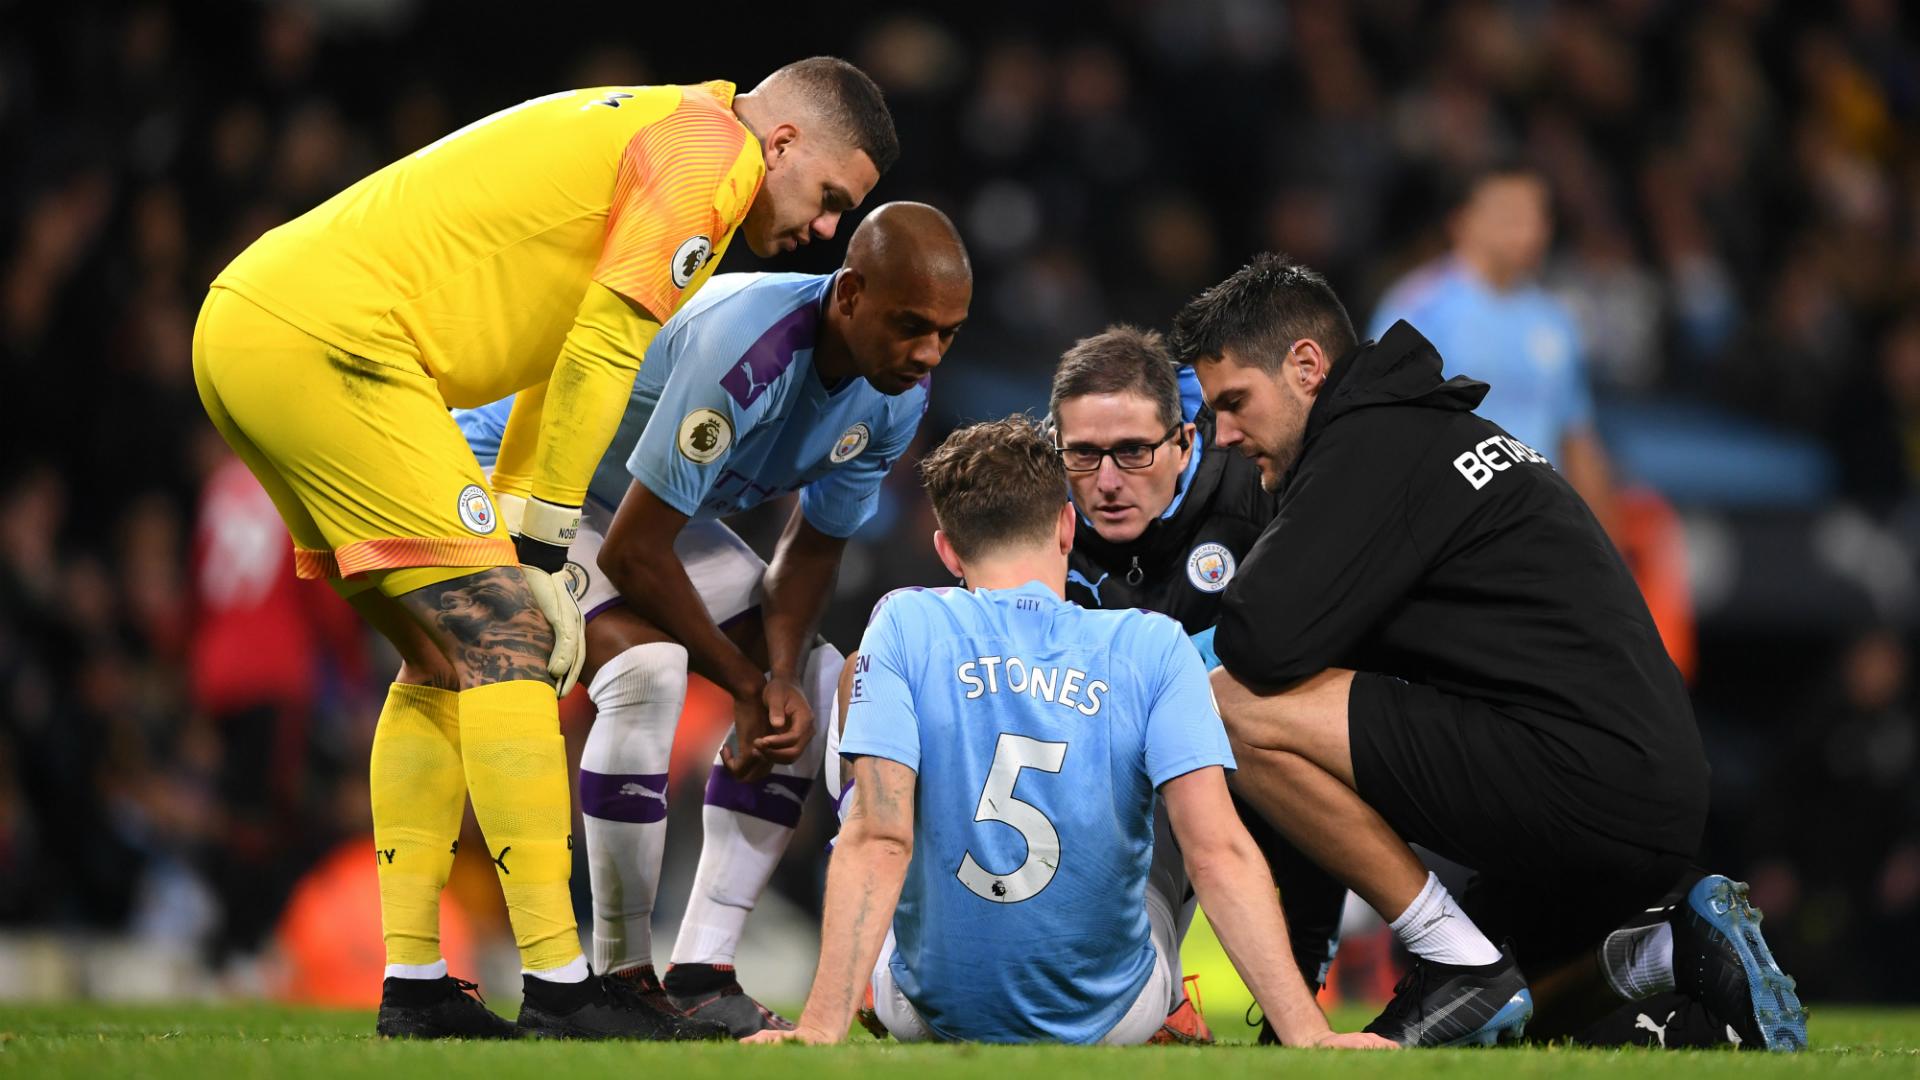 Man City defender Stones misses Zagreb trip